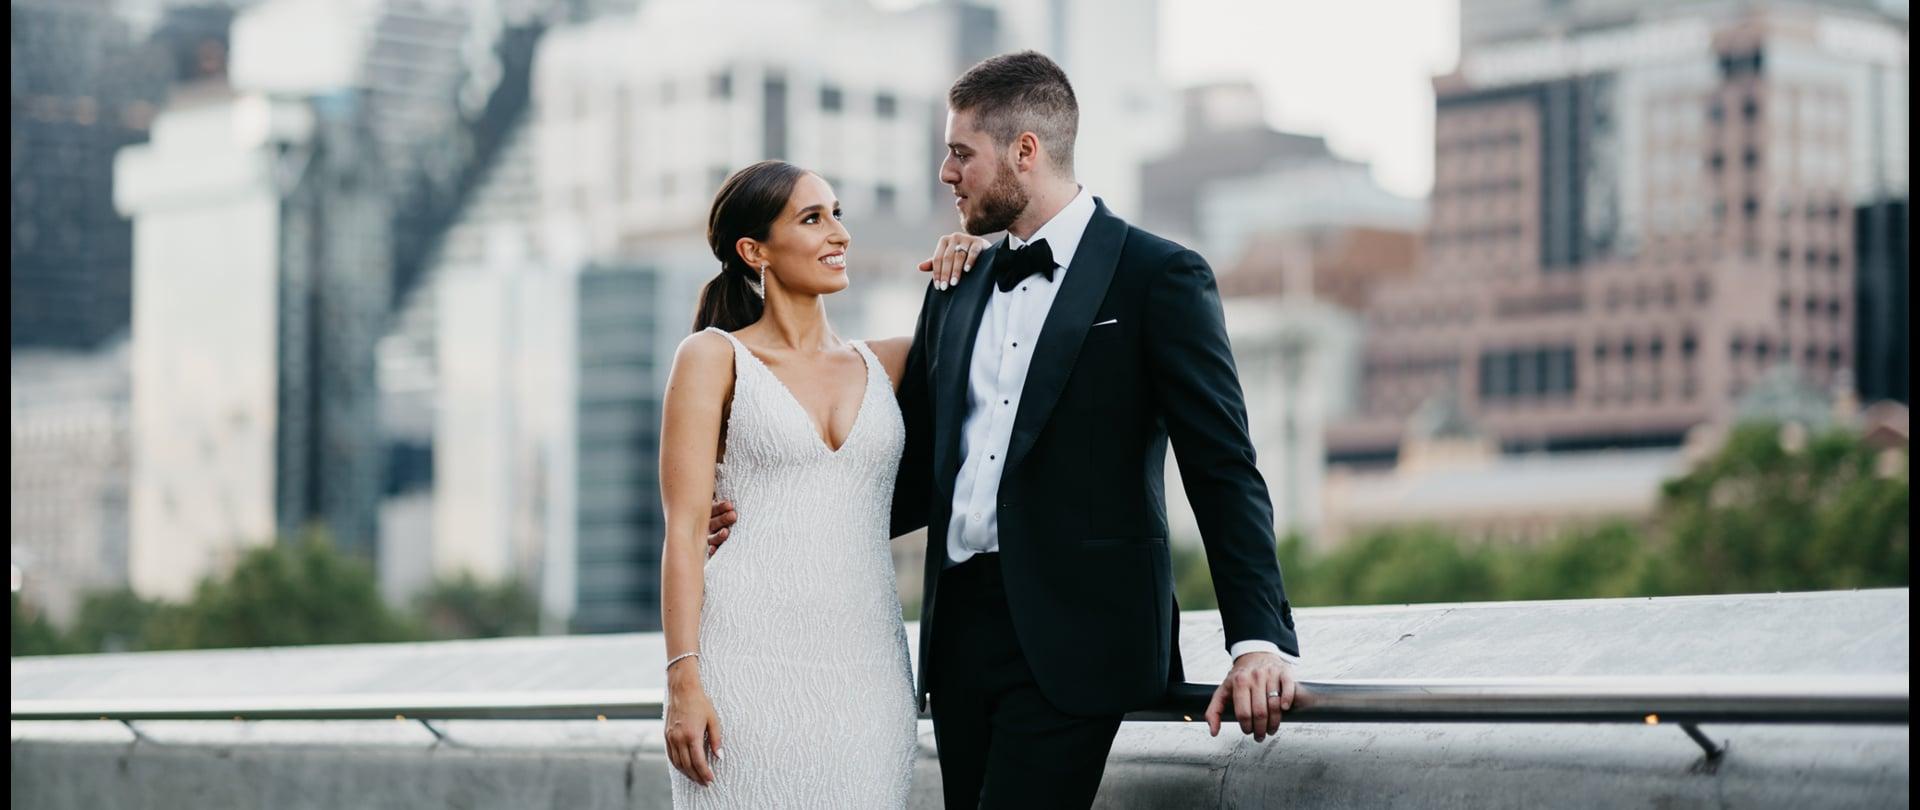 Stephanie & Cameron Wedding Video Filmed at Melbourne, Victoria